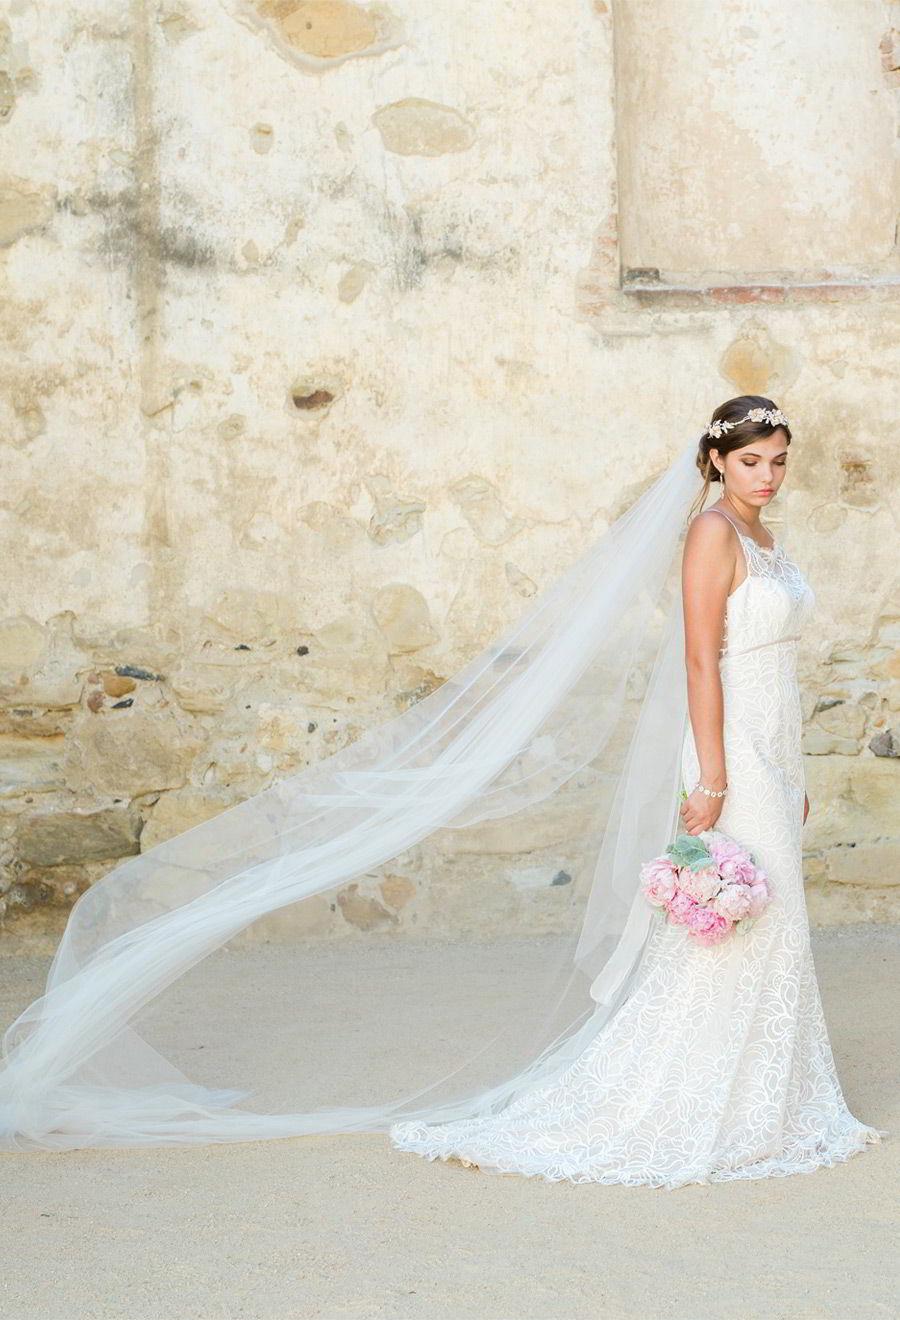 d7f1a32ba2 bel aire bridal accessories 6778 soft fabric flowers rhinestone pearl  headpiece V7333C cathedral veil wedding dress